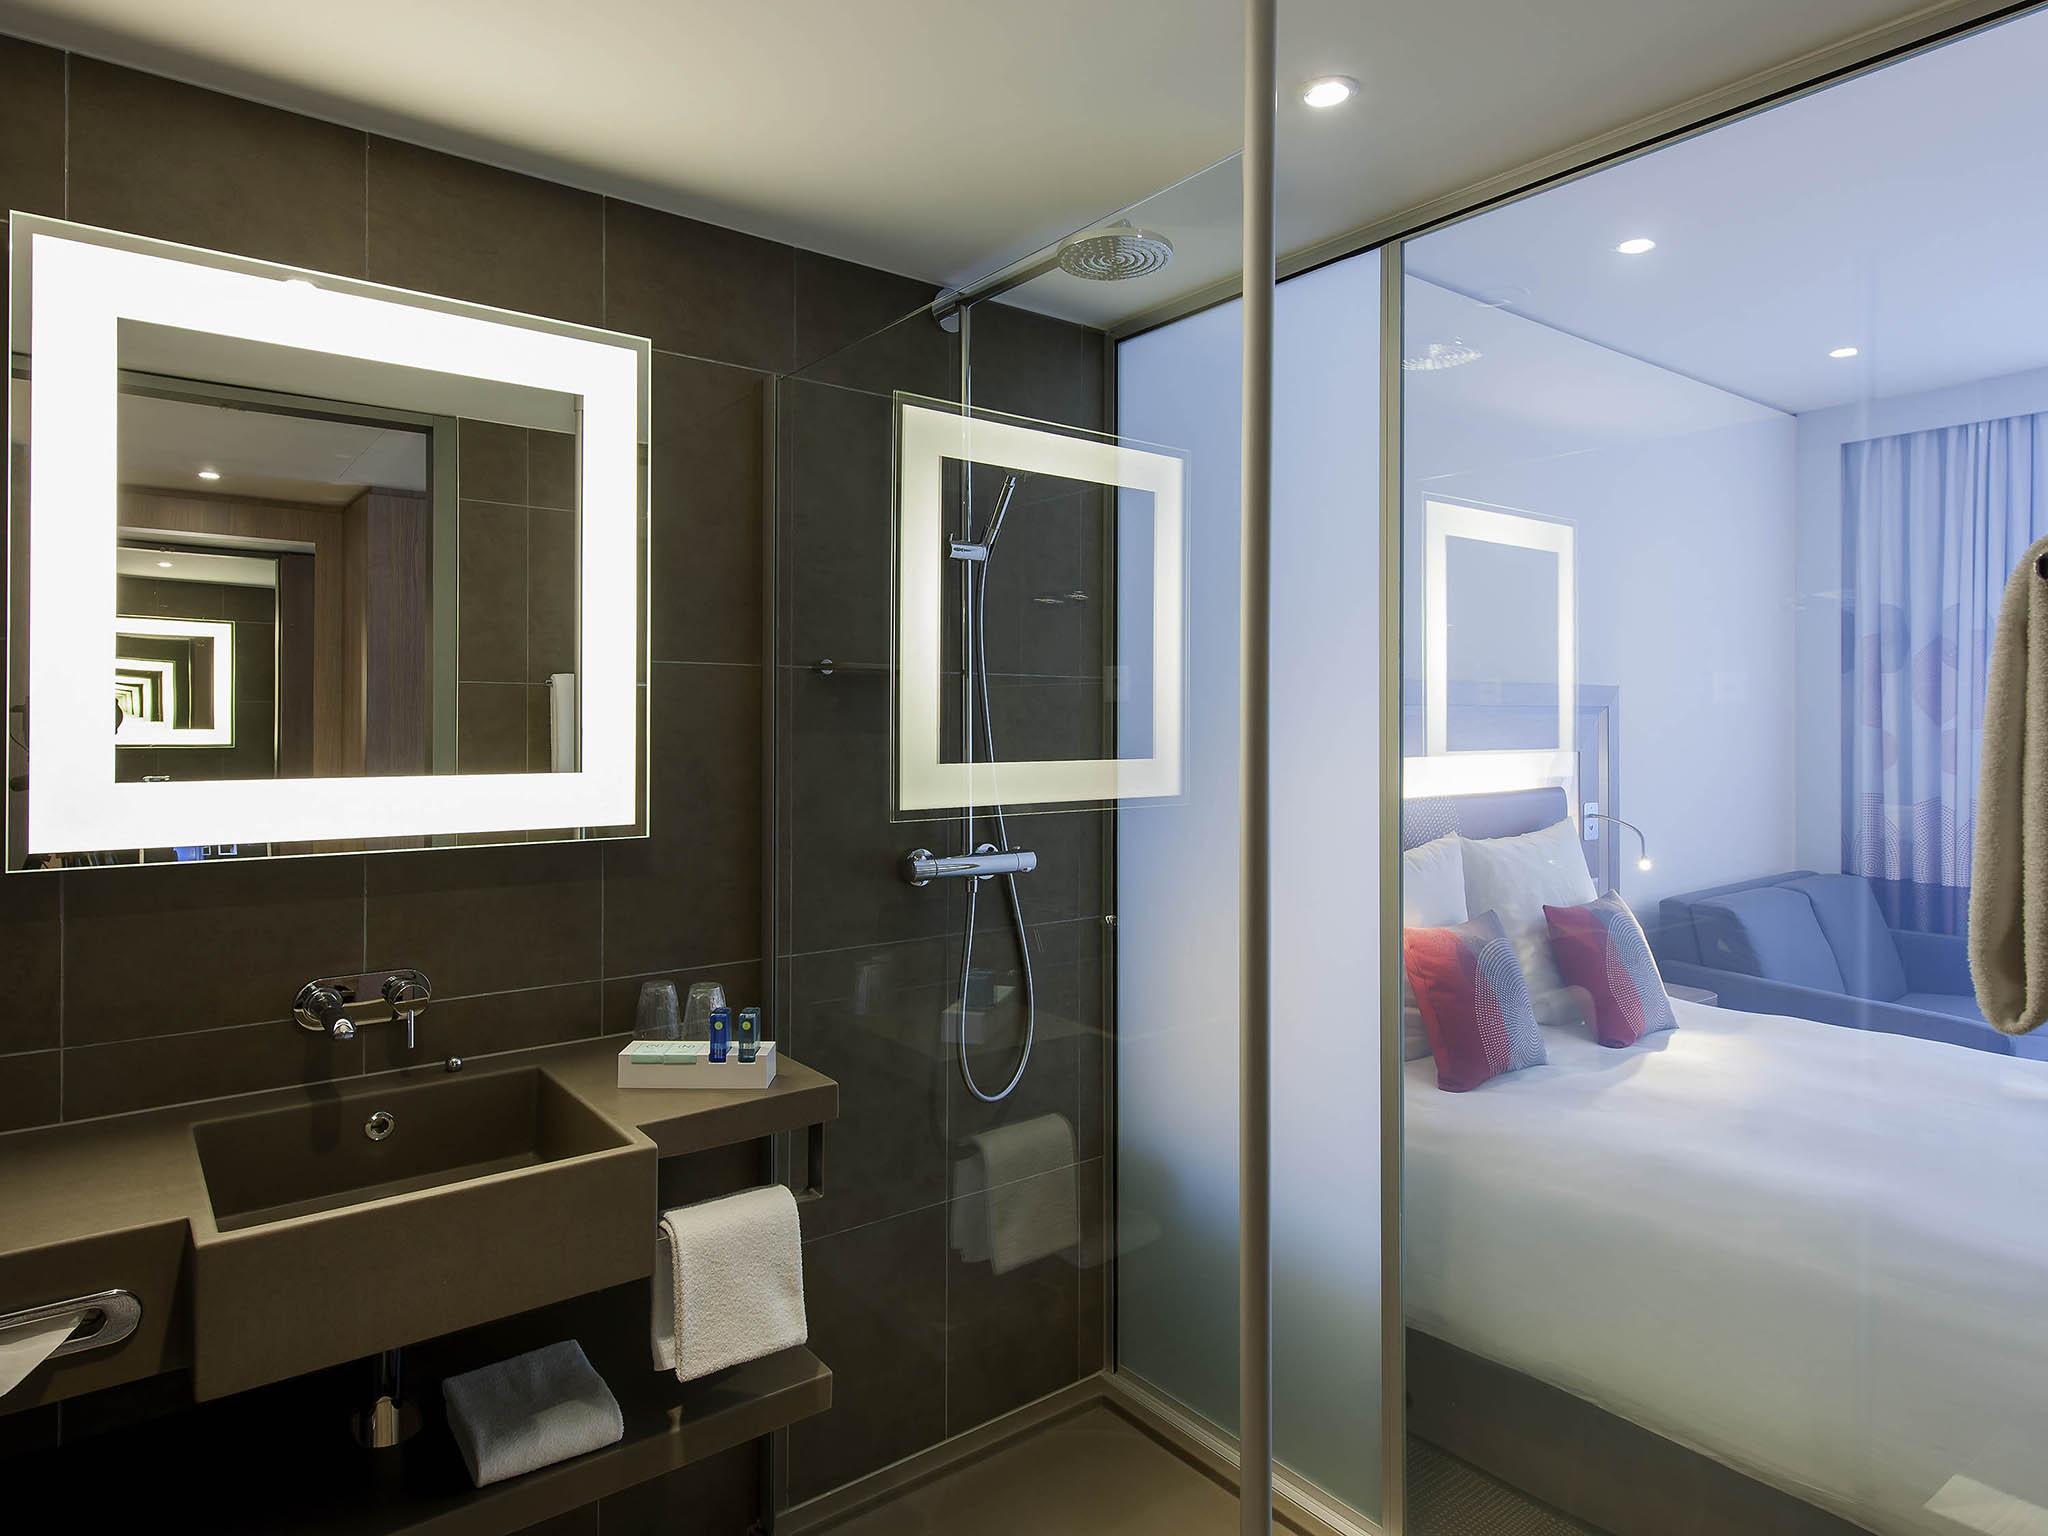 بالصور حمامات فنادق , افخم حمامات الفنادق 4881 11